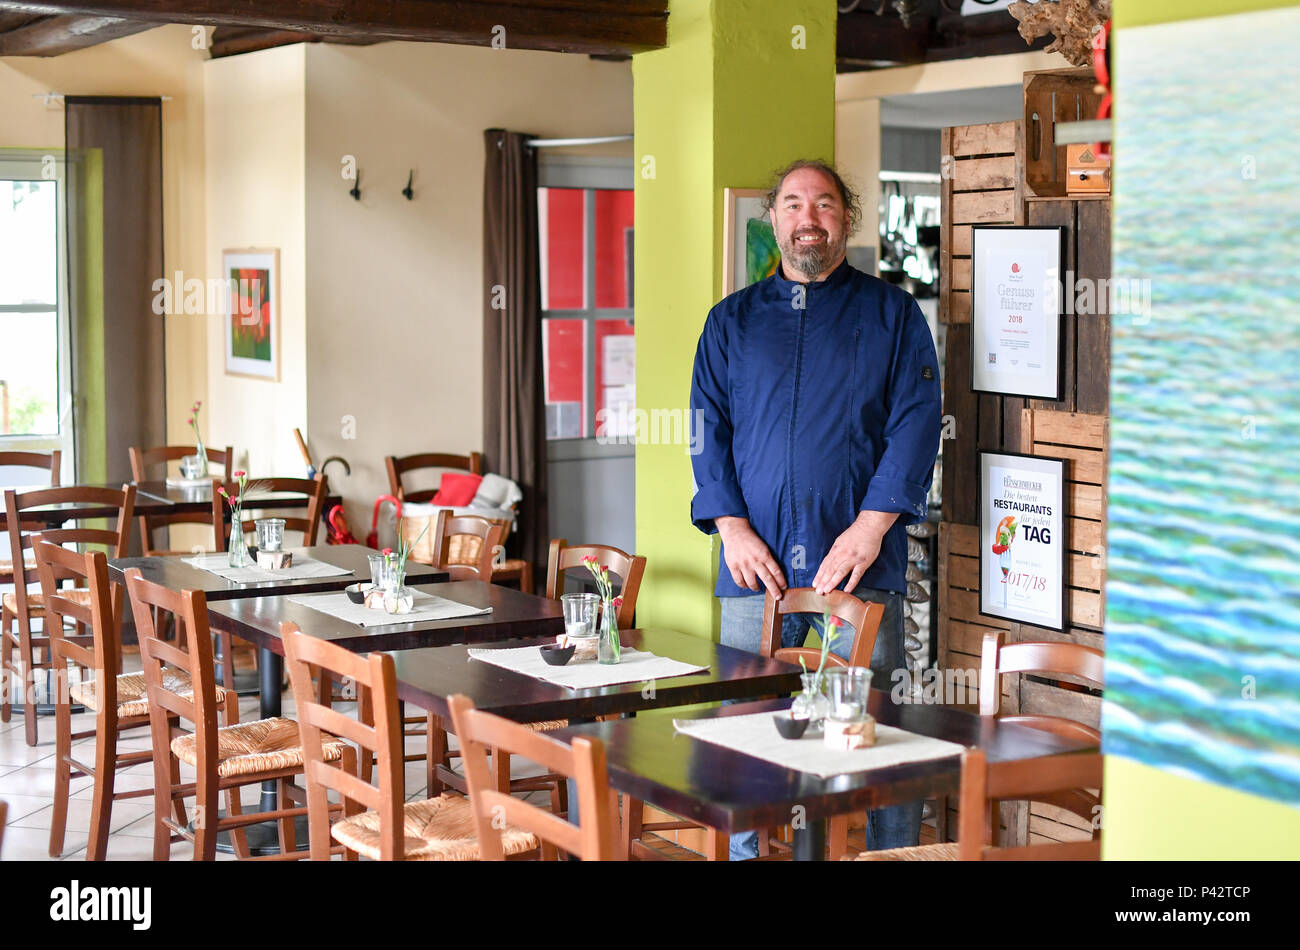 Jens Restaurant Stock s & Jens Restaurant Stock